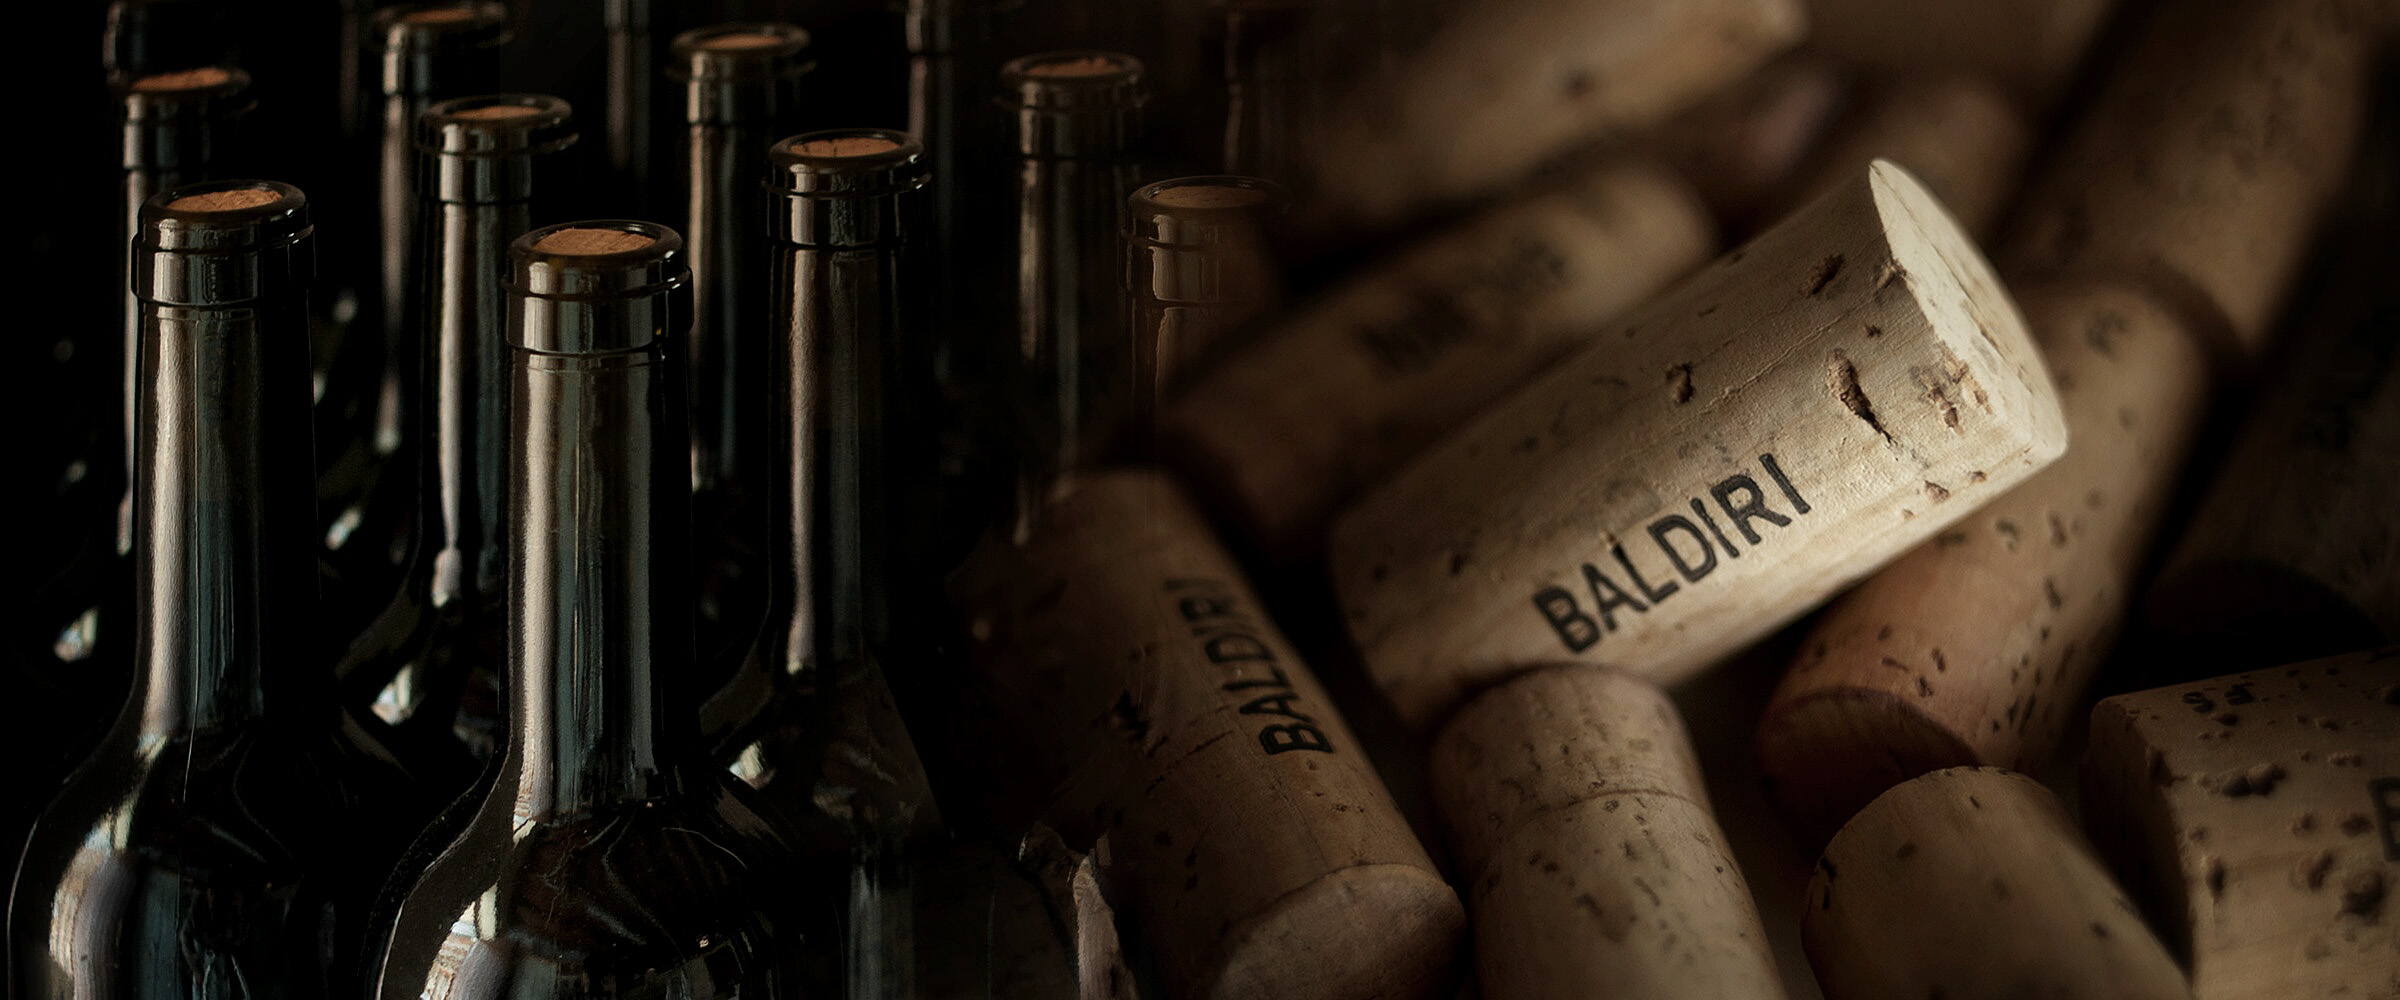 Baldiri-Vins